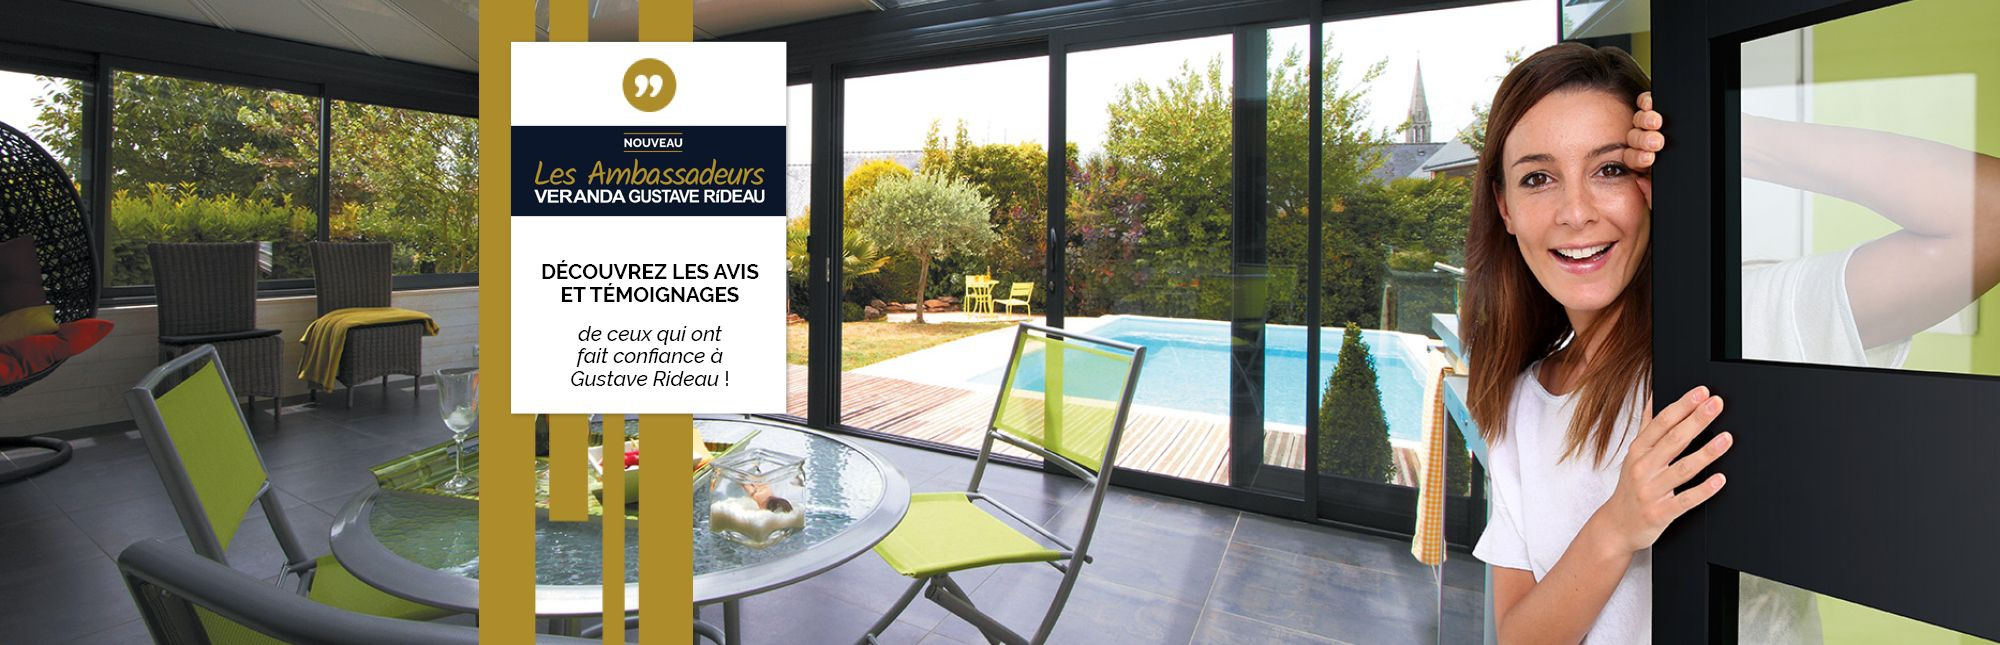 Abri De Terrasse En Aluminium: Fabrication Sur Mesure - Abri ... avec Abris De Terrasse